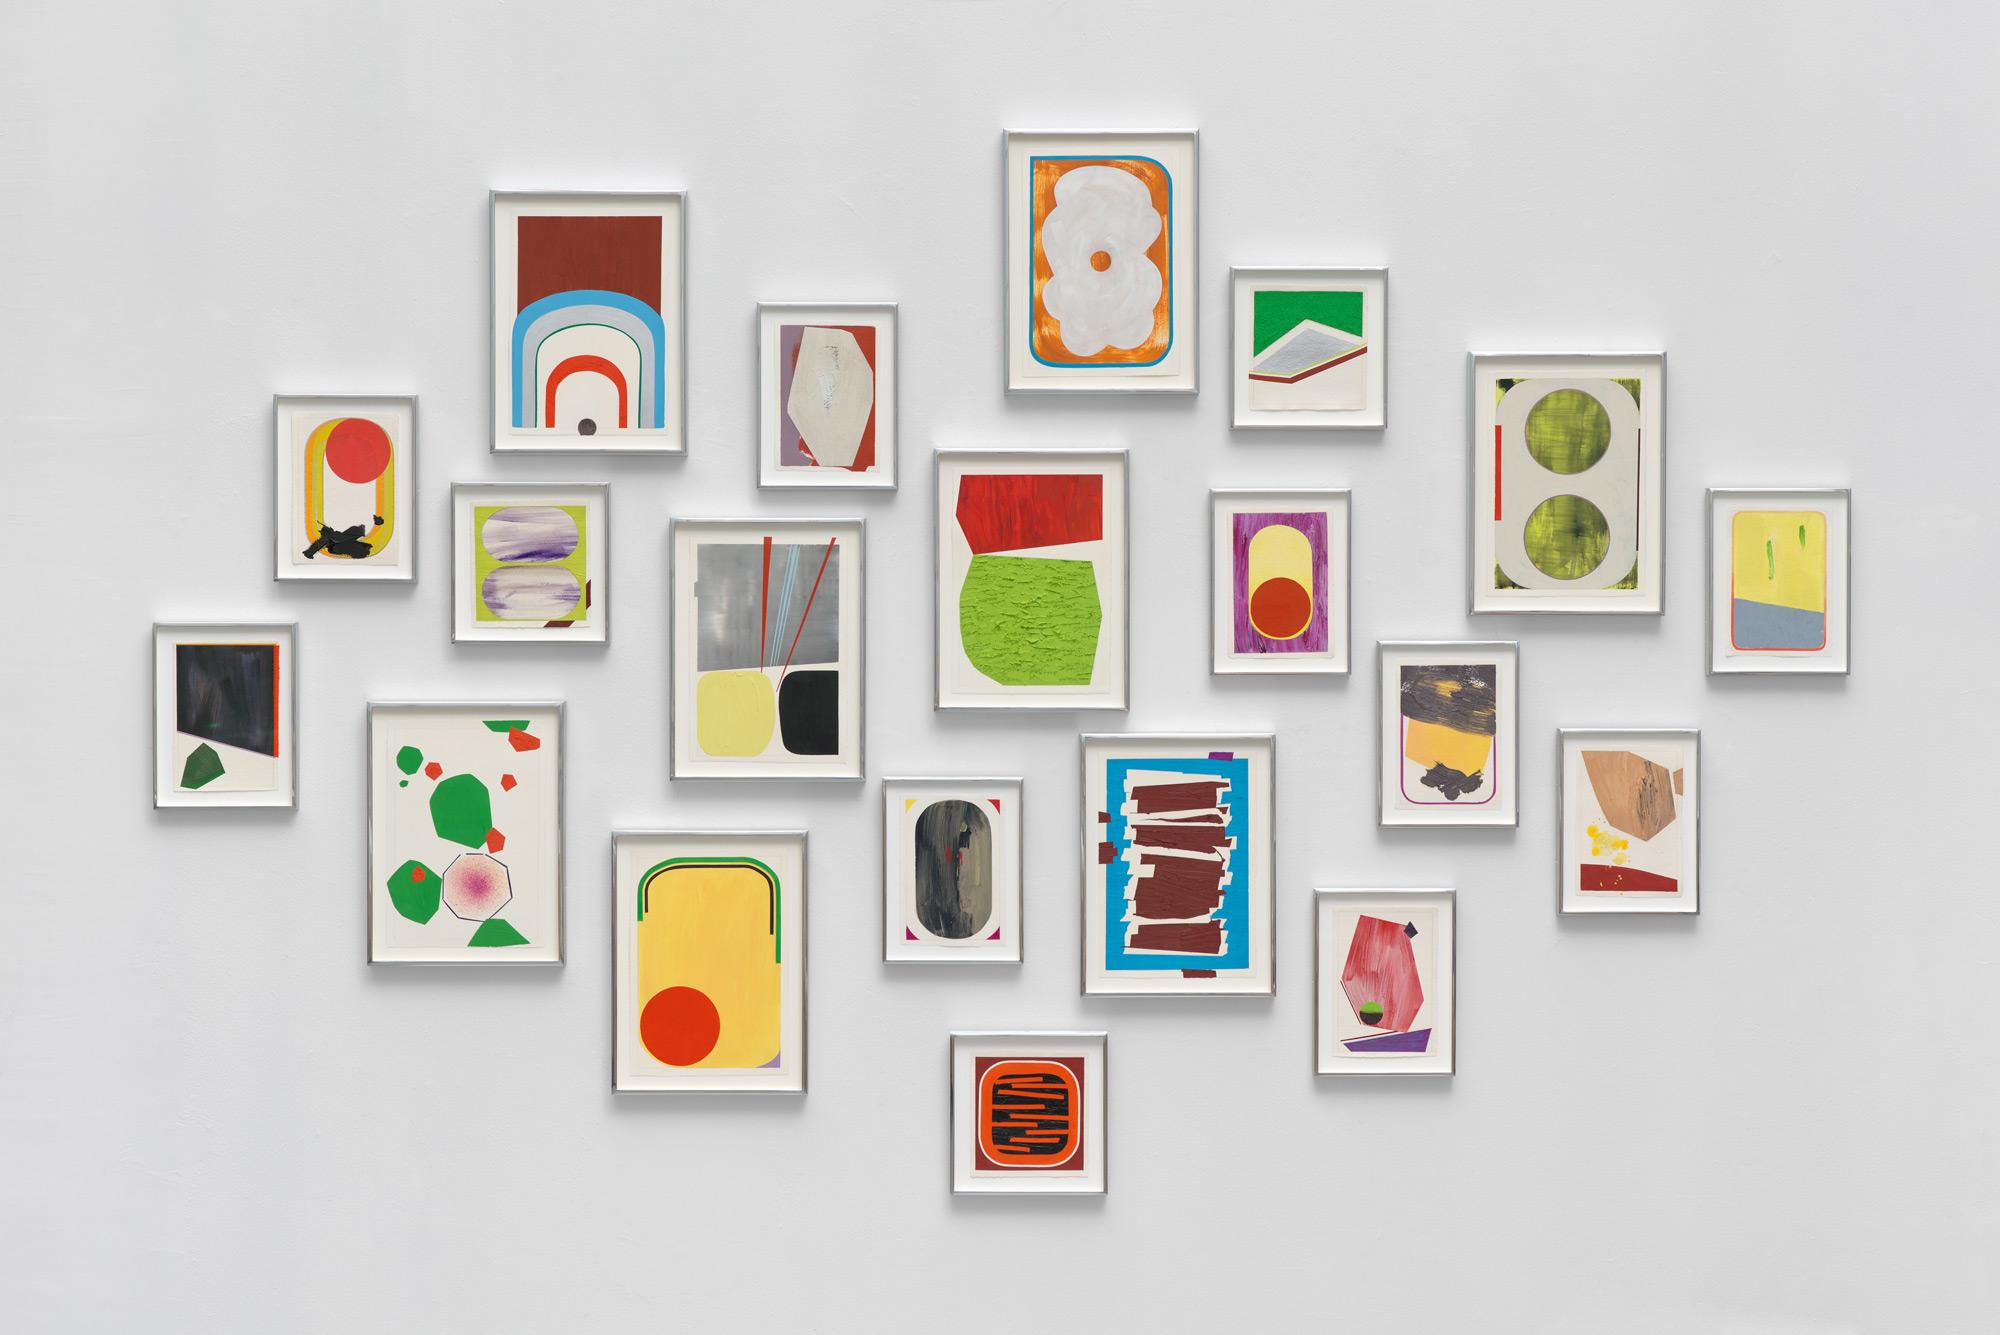 Oil Studies,  2013 oil on paper 20 framed works, 58 x 92 inches overall 8 at 14½ x 10¾ inches 9 at 10¼ x 7¾ inches 3 at 6⅞ x 6⅝ inches